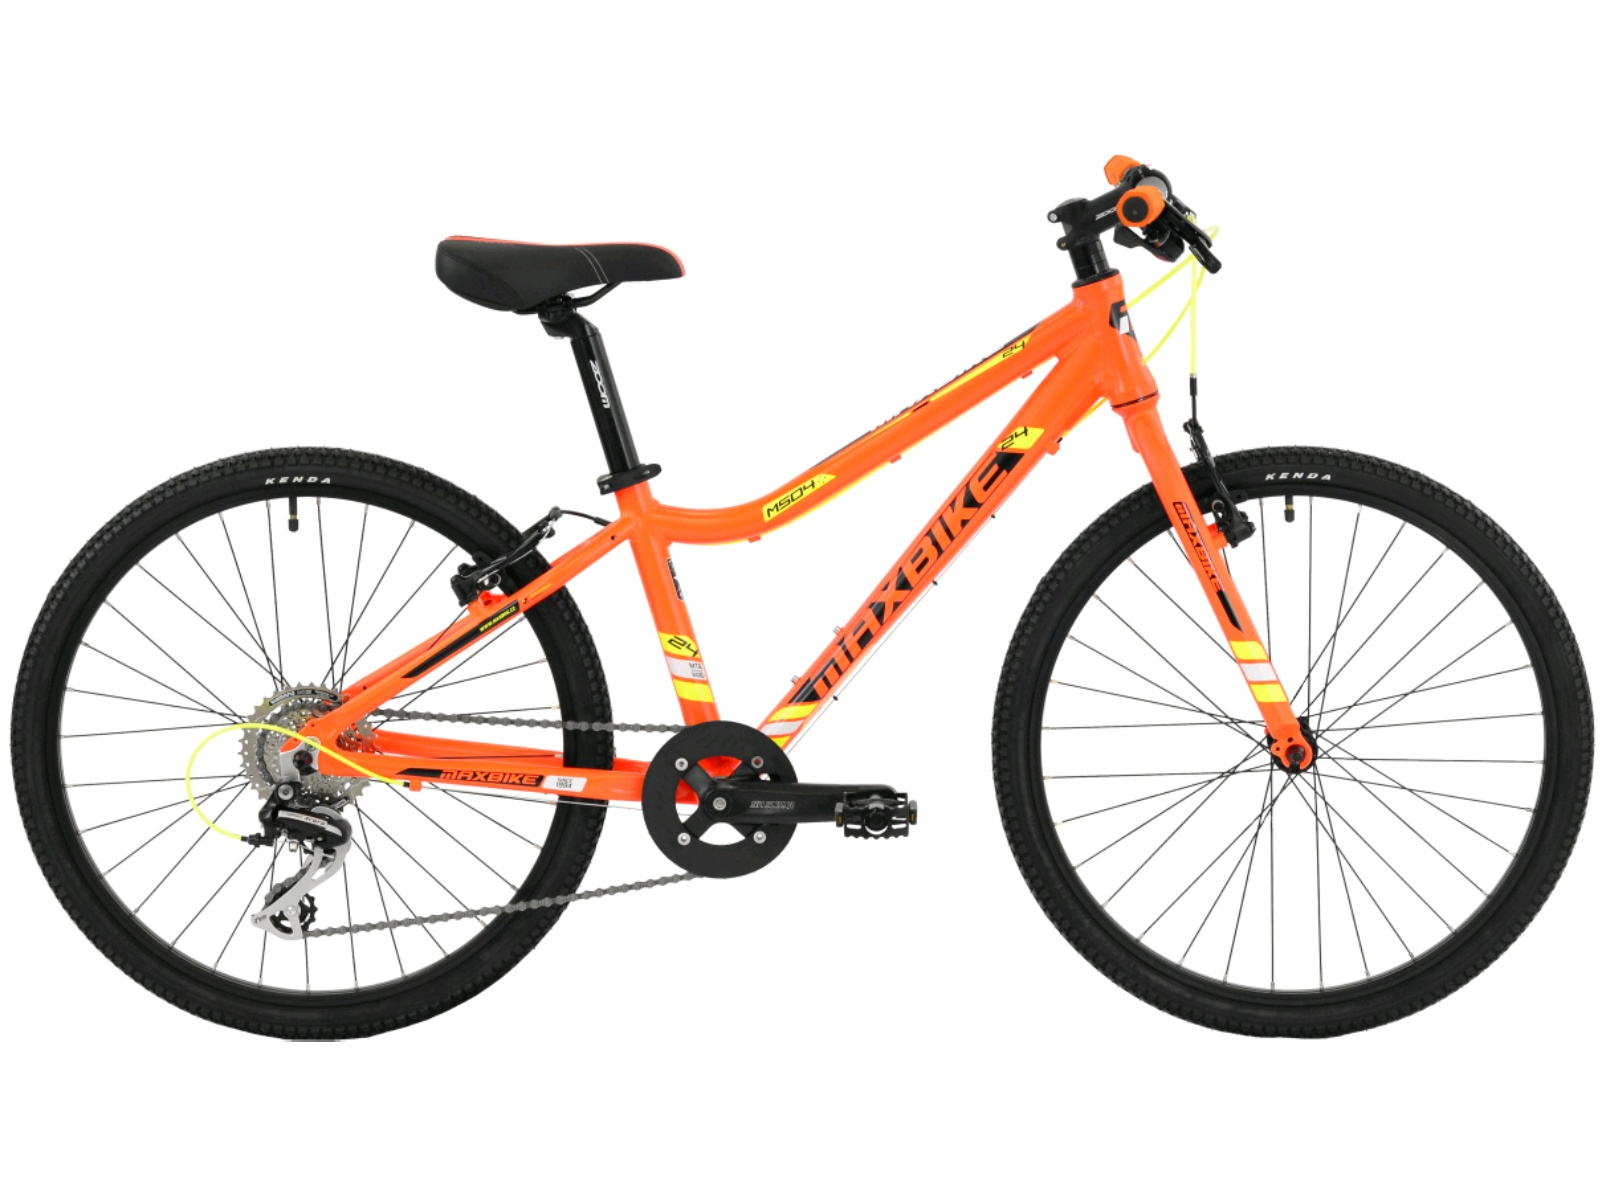 "Detský bicykel MAXBIKE Pirin 24"" - biele"